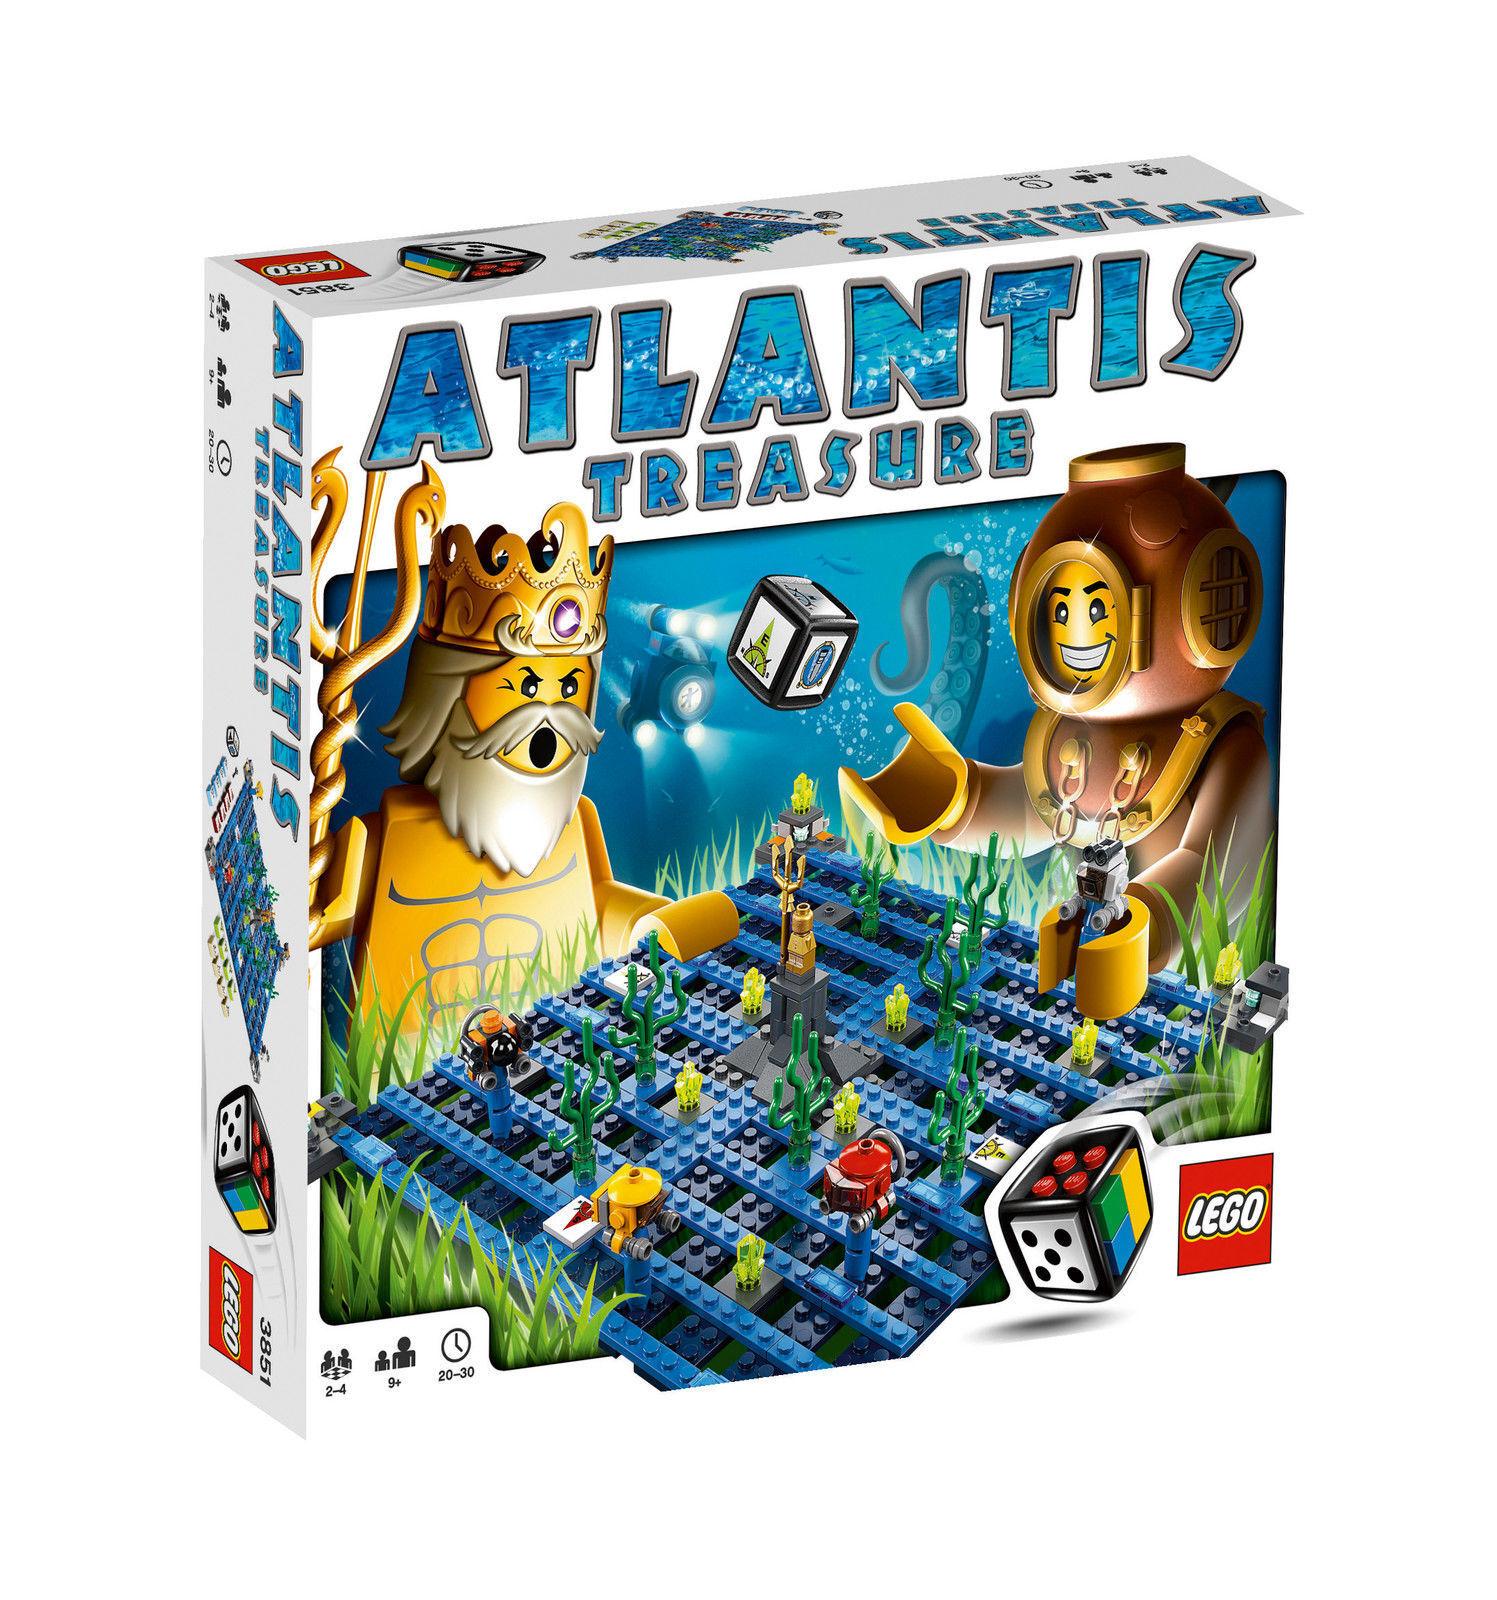 LEGO LEGO LEGO 3851 - Games Atlantis Treasure   NEU OVP RAR   Komplett 8f1fc3